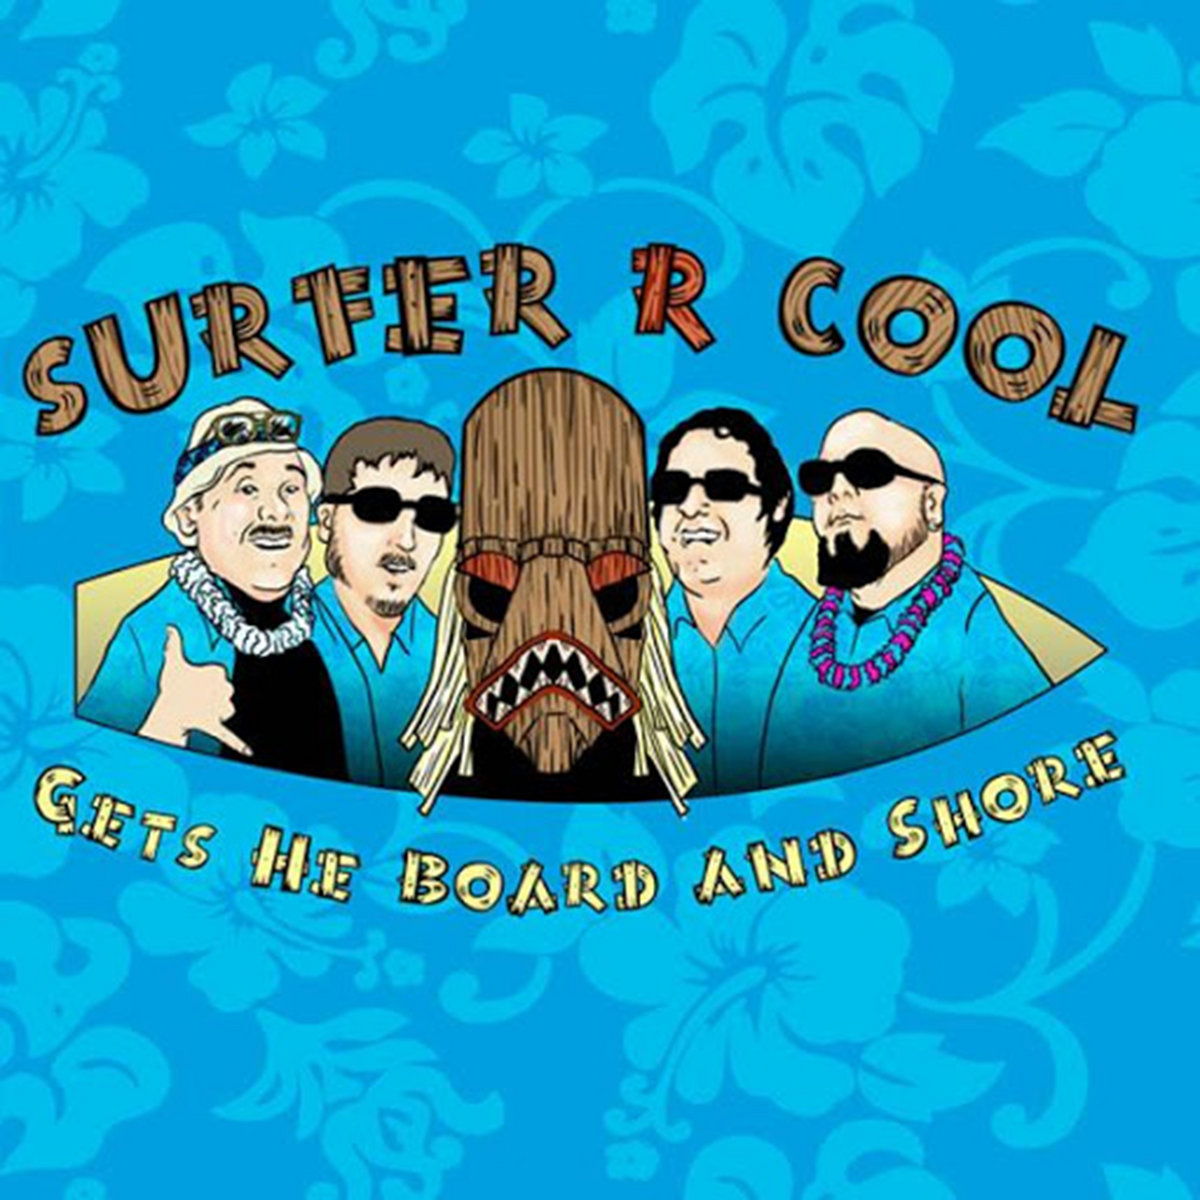 Surfer r cool bandcamp